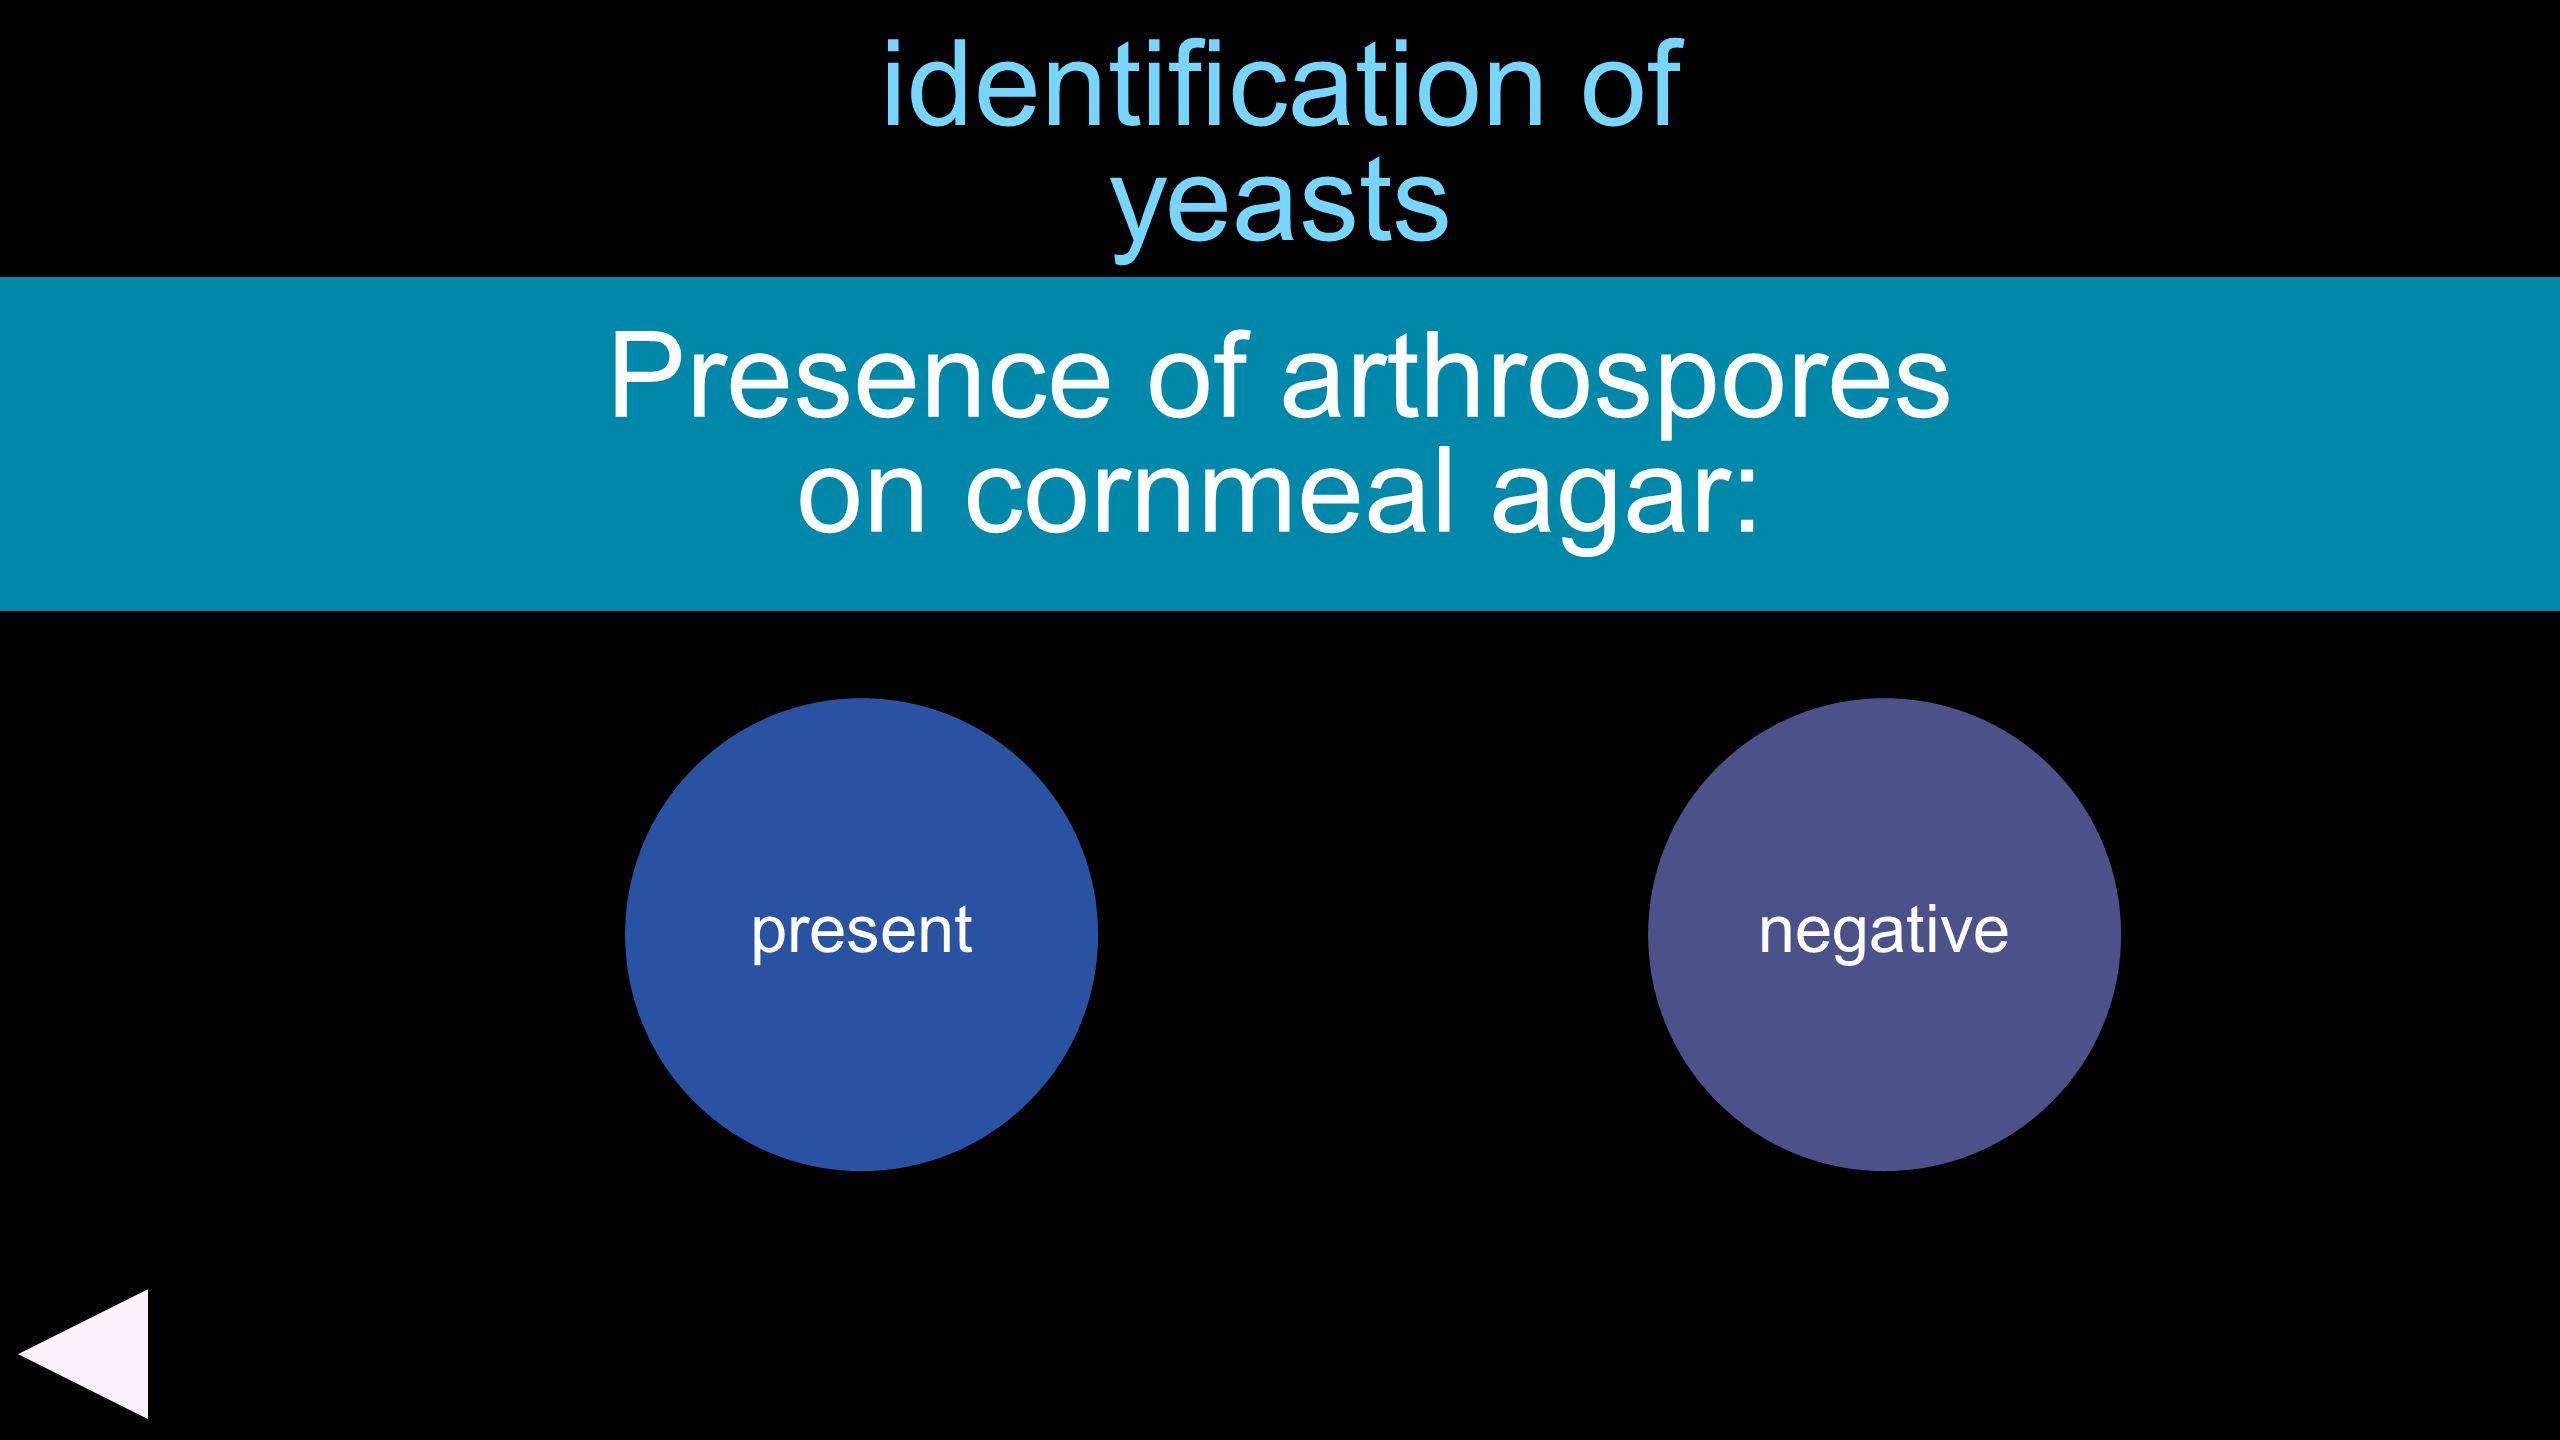 identification of yeasts Presence of arthrospores on cornmeal agar: presentnegative